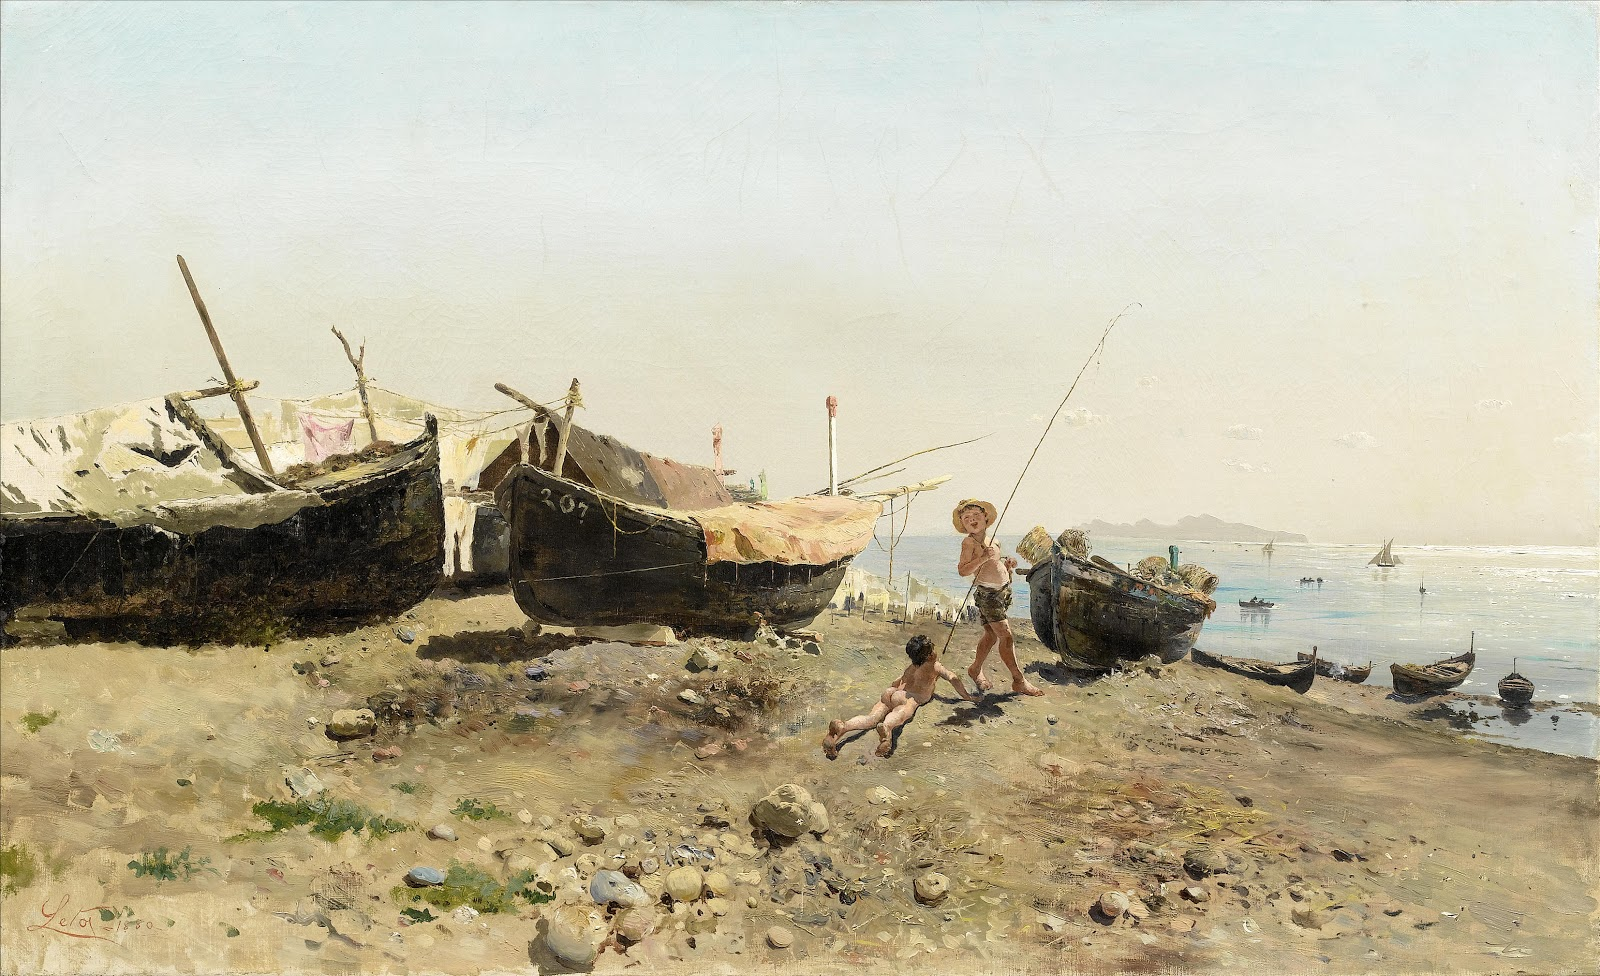 Antonino Leto Sulla riva Mergellina